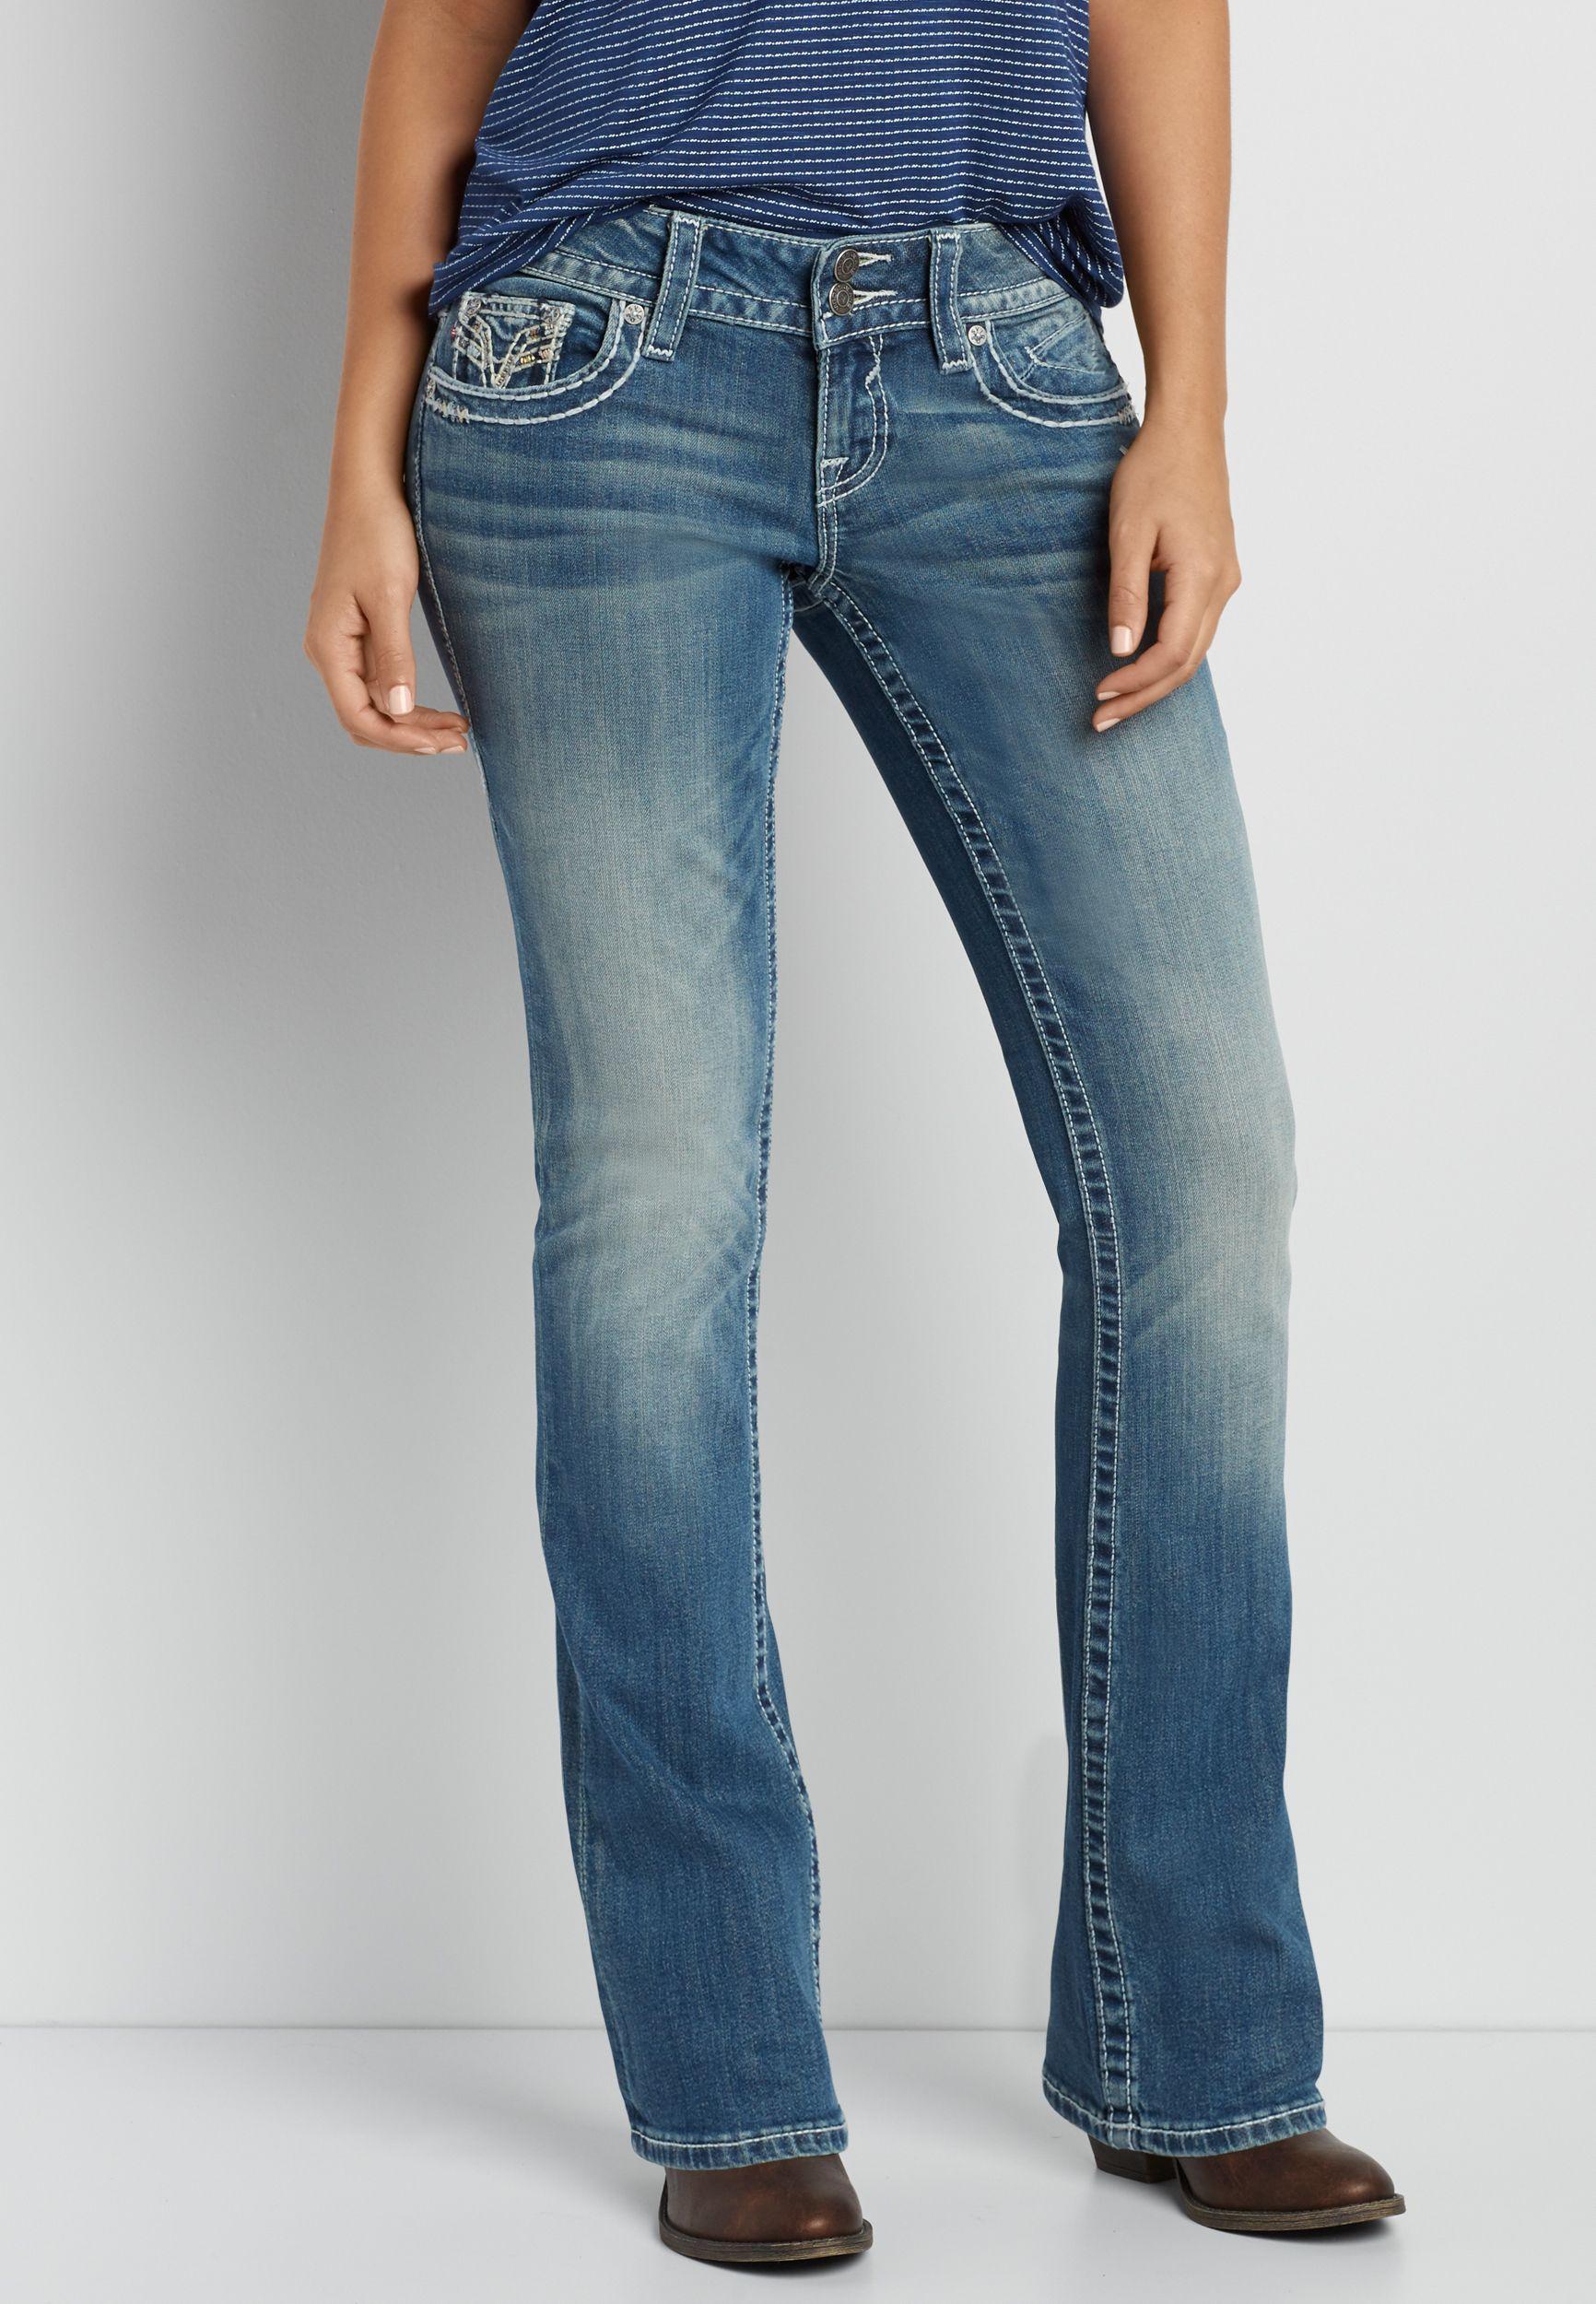 08ea5a3bf33c Vigoss ® medium wash bootcut jeans with back flap pockets (original price